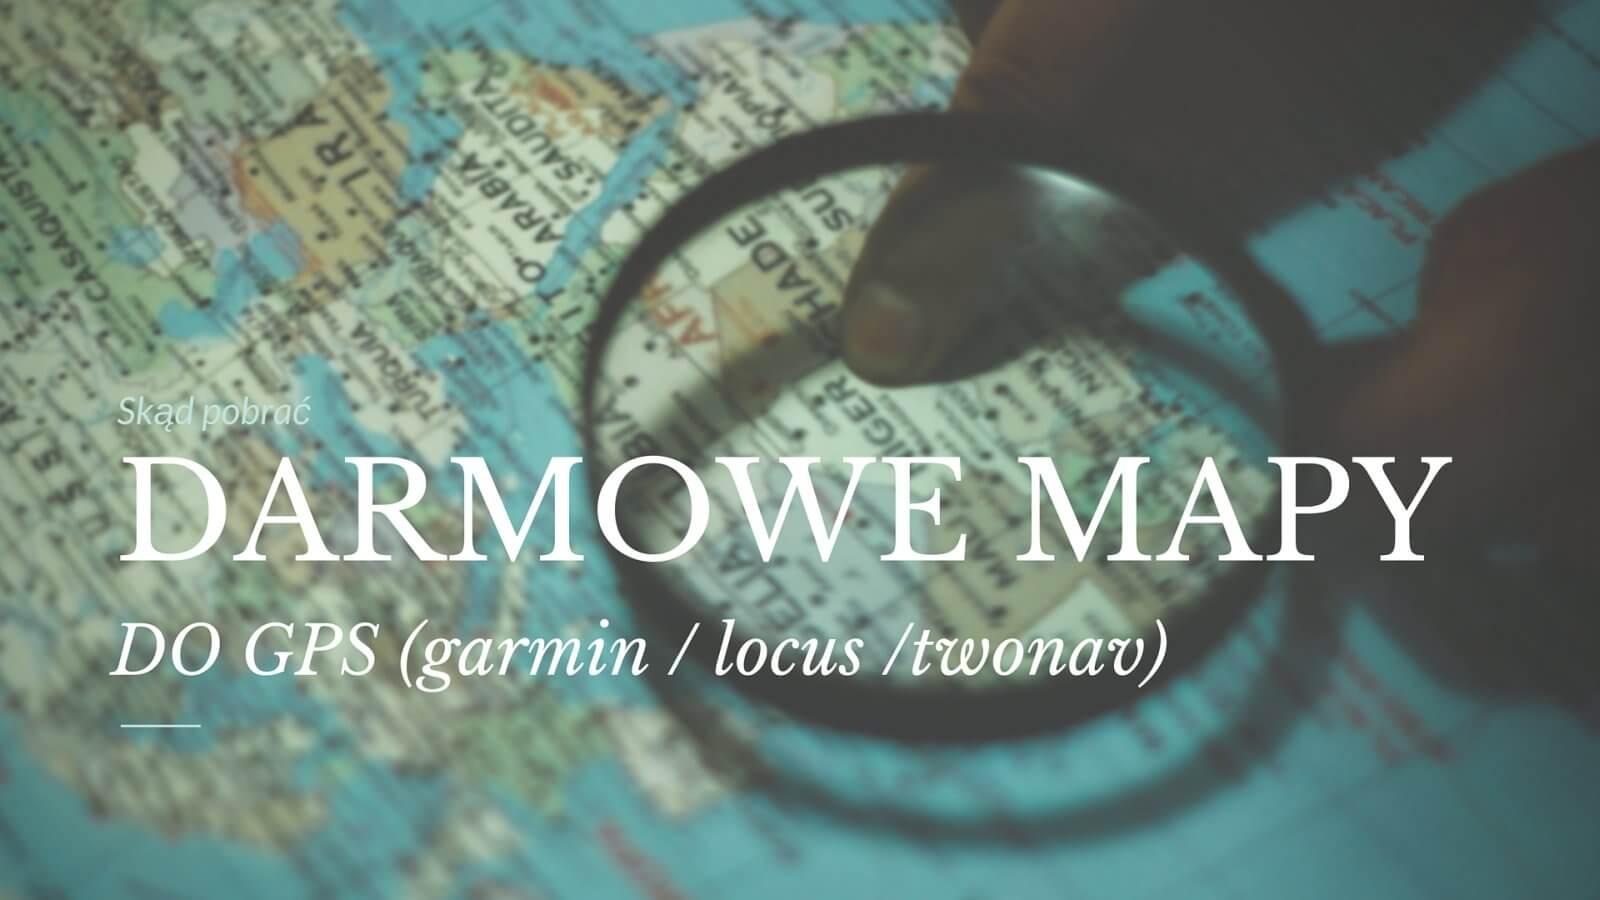 Darmowe mapy - main - 1600 (1)